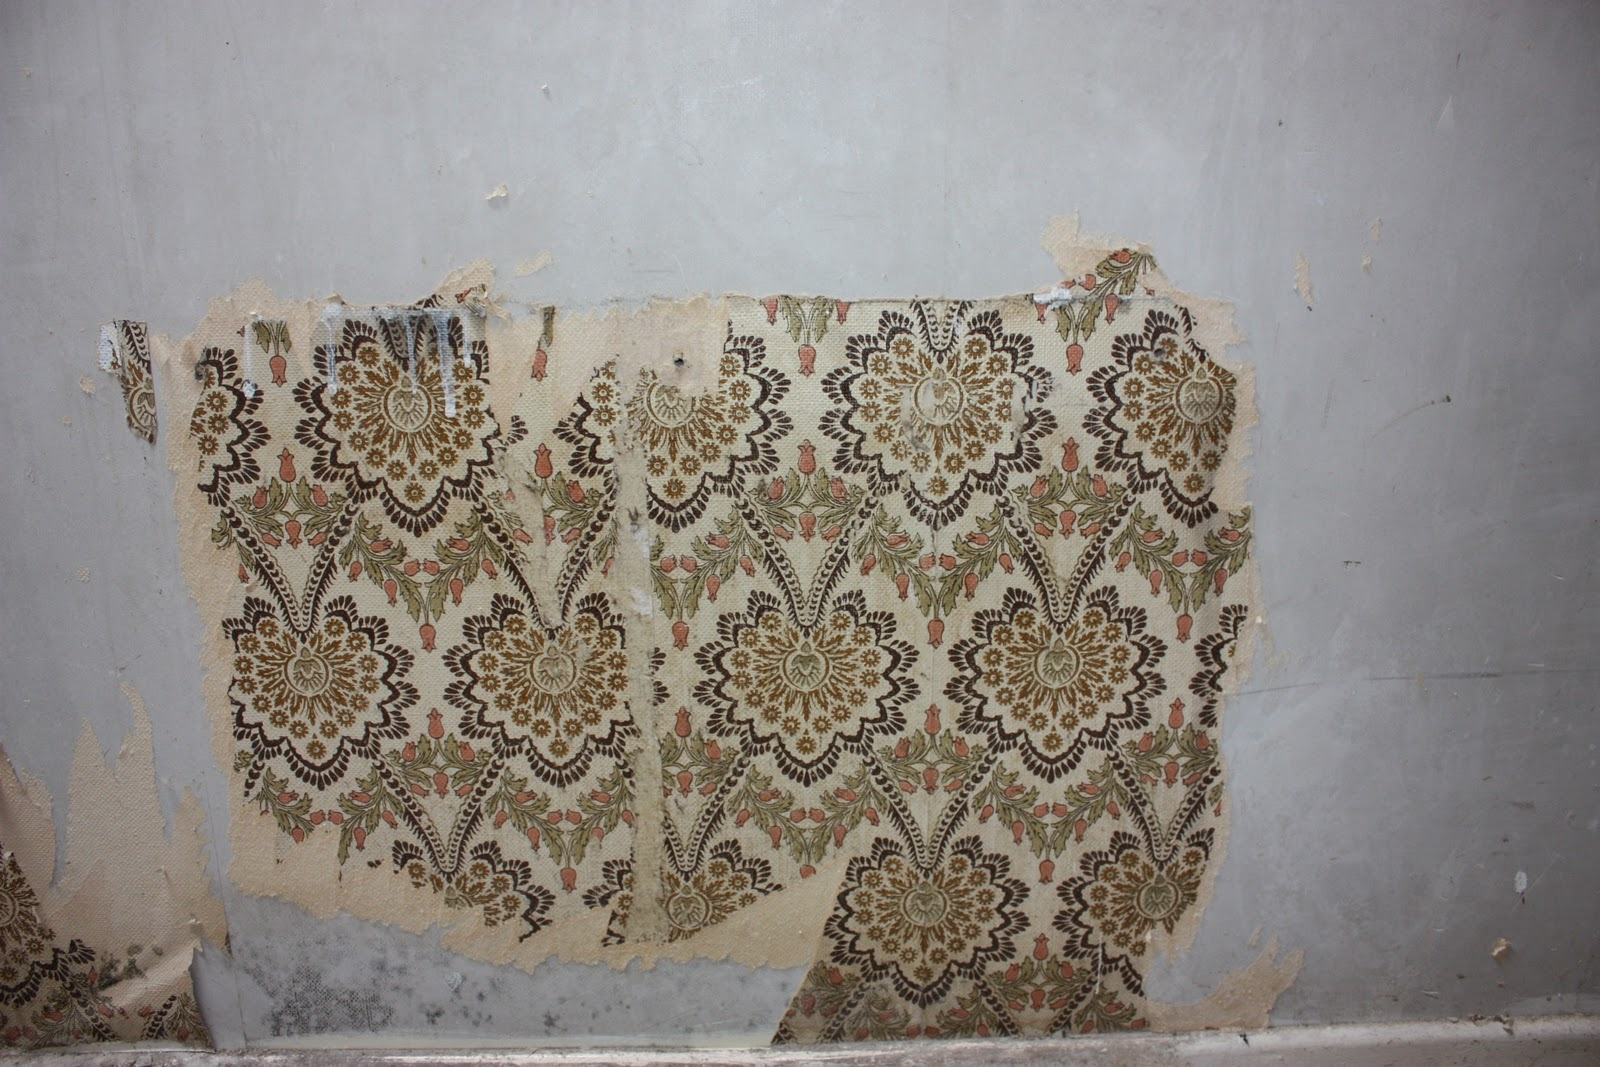 wallpaper: Wallpaper Peeling Off Walls